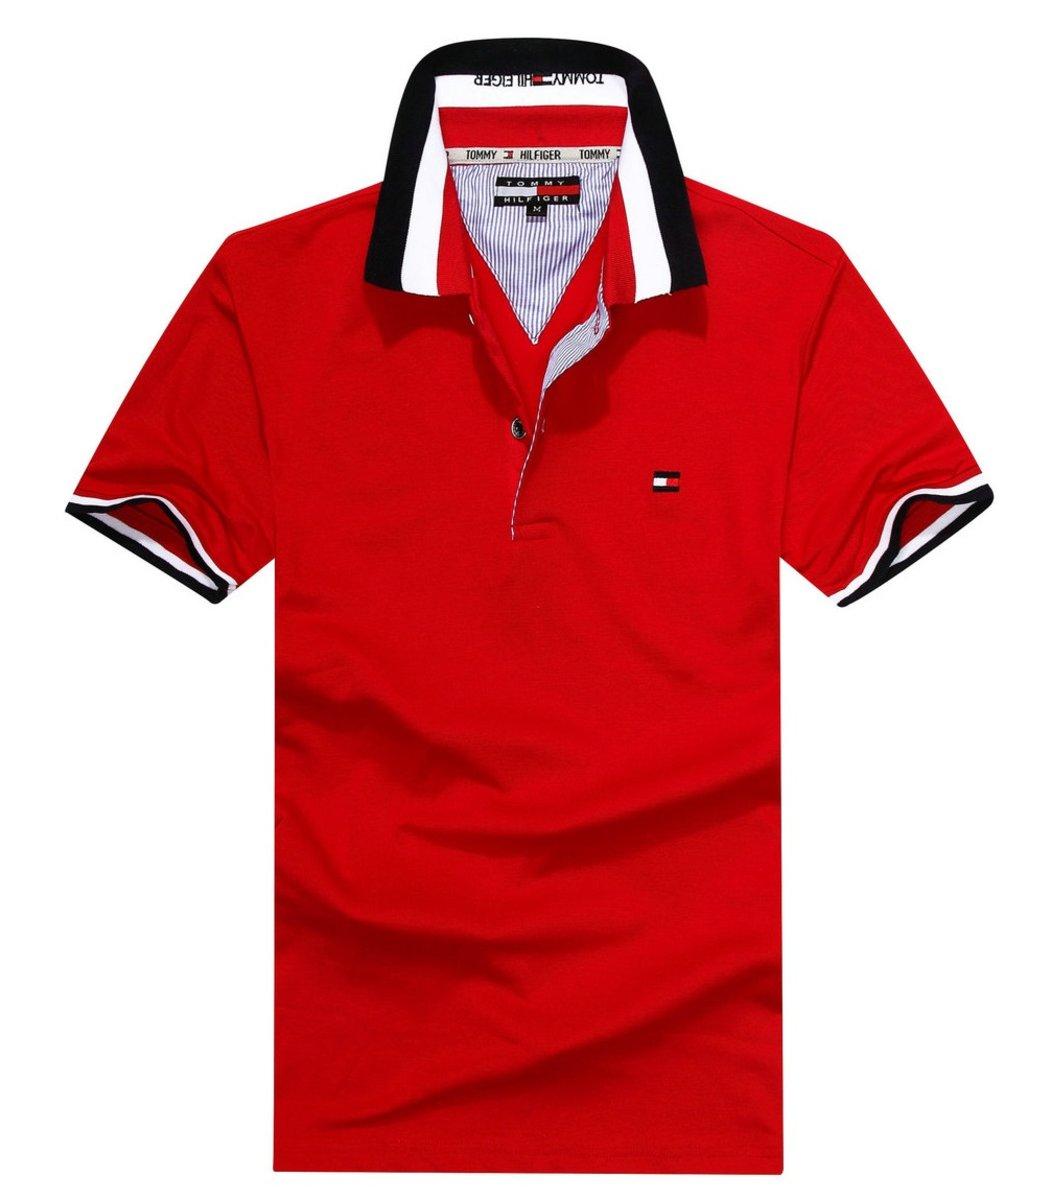 Мужская красная футболка поло Tommy Hilfiger